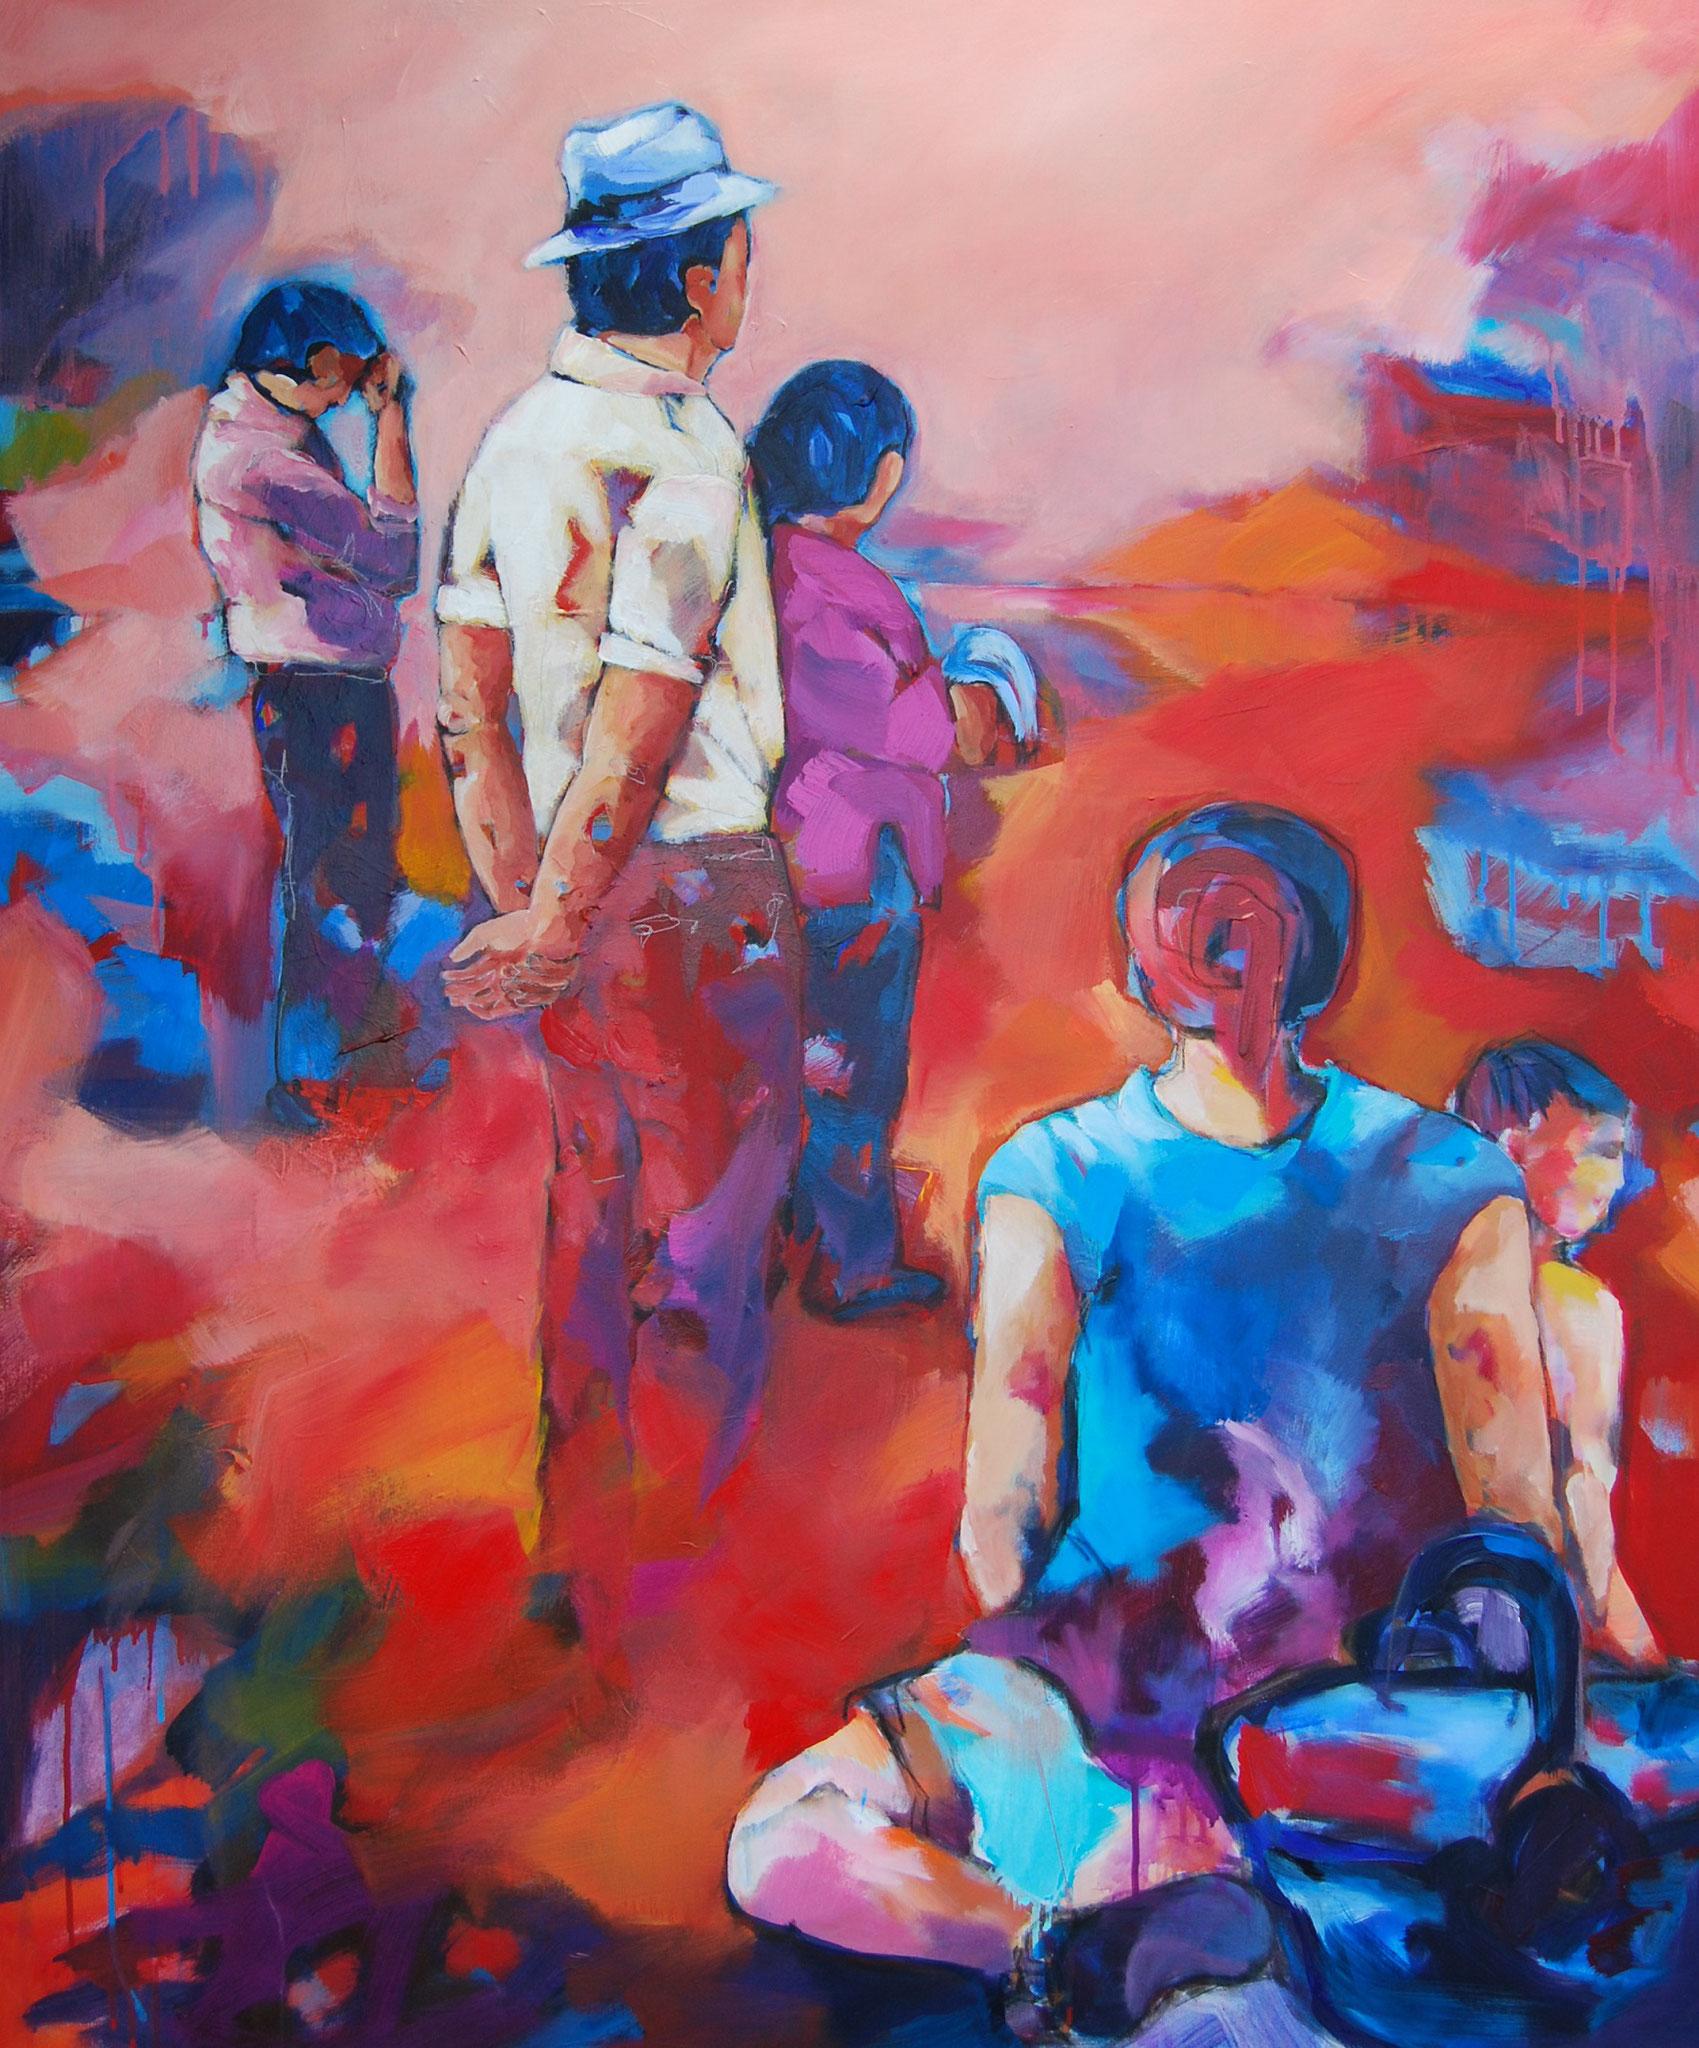 Weitsicht , 2015, Acryl auf Leinwand, 120 x 100 cm